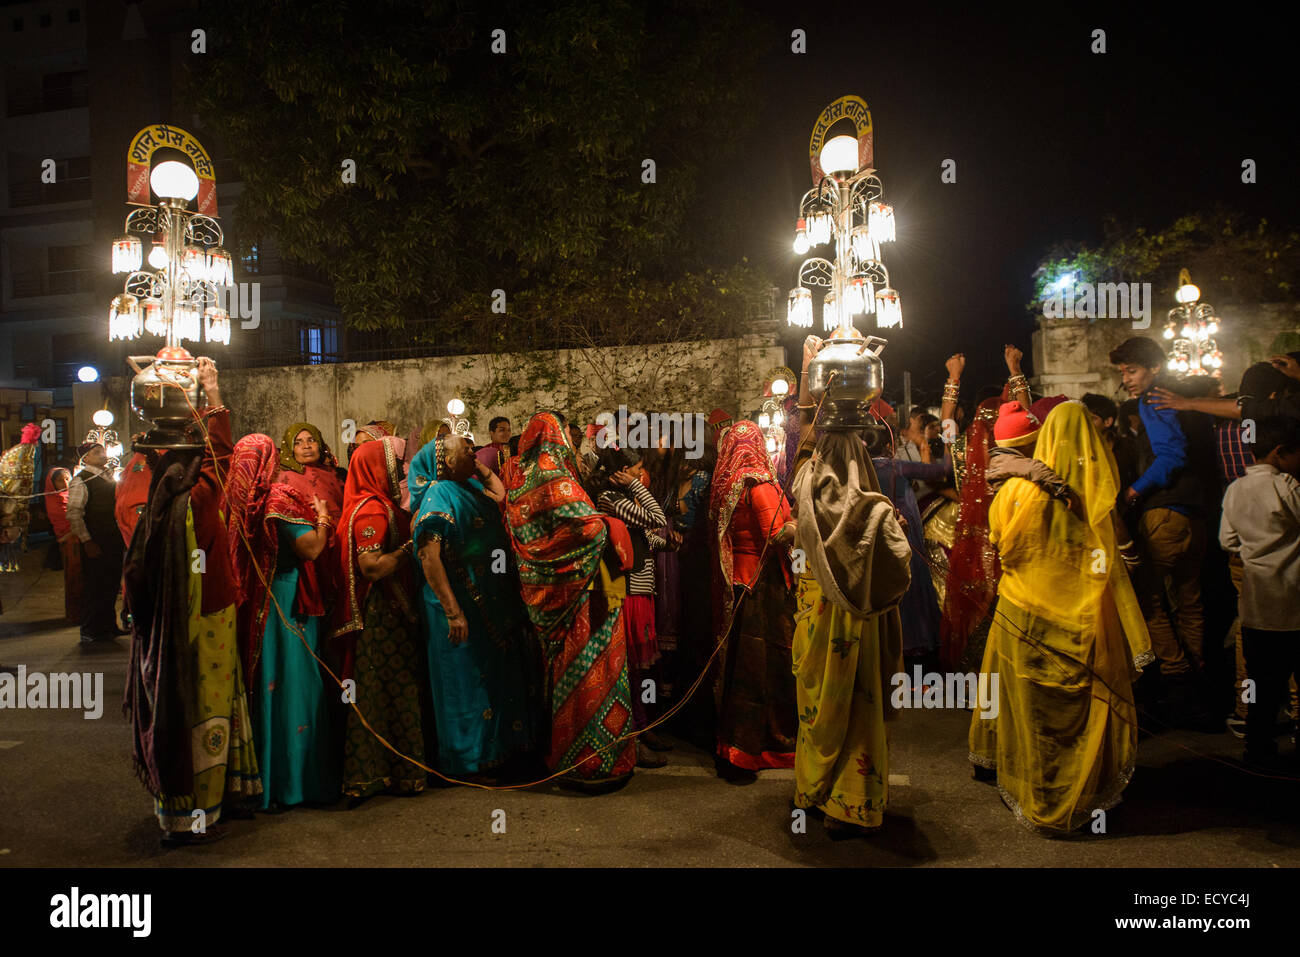 Indian wedding procession jaipur india stock photo royalty free indian wedding procession jaipur india junglespirit Images